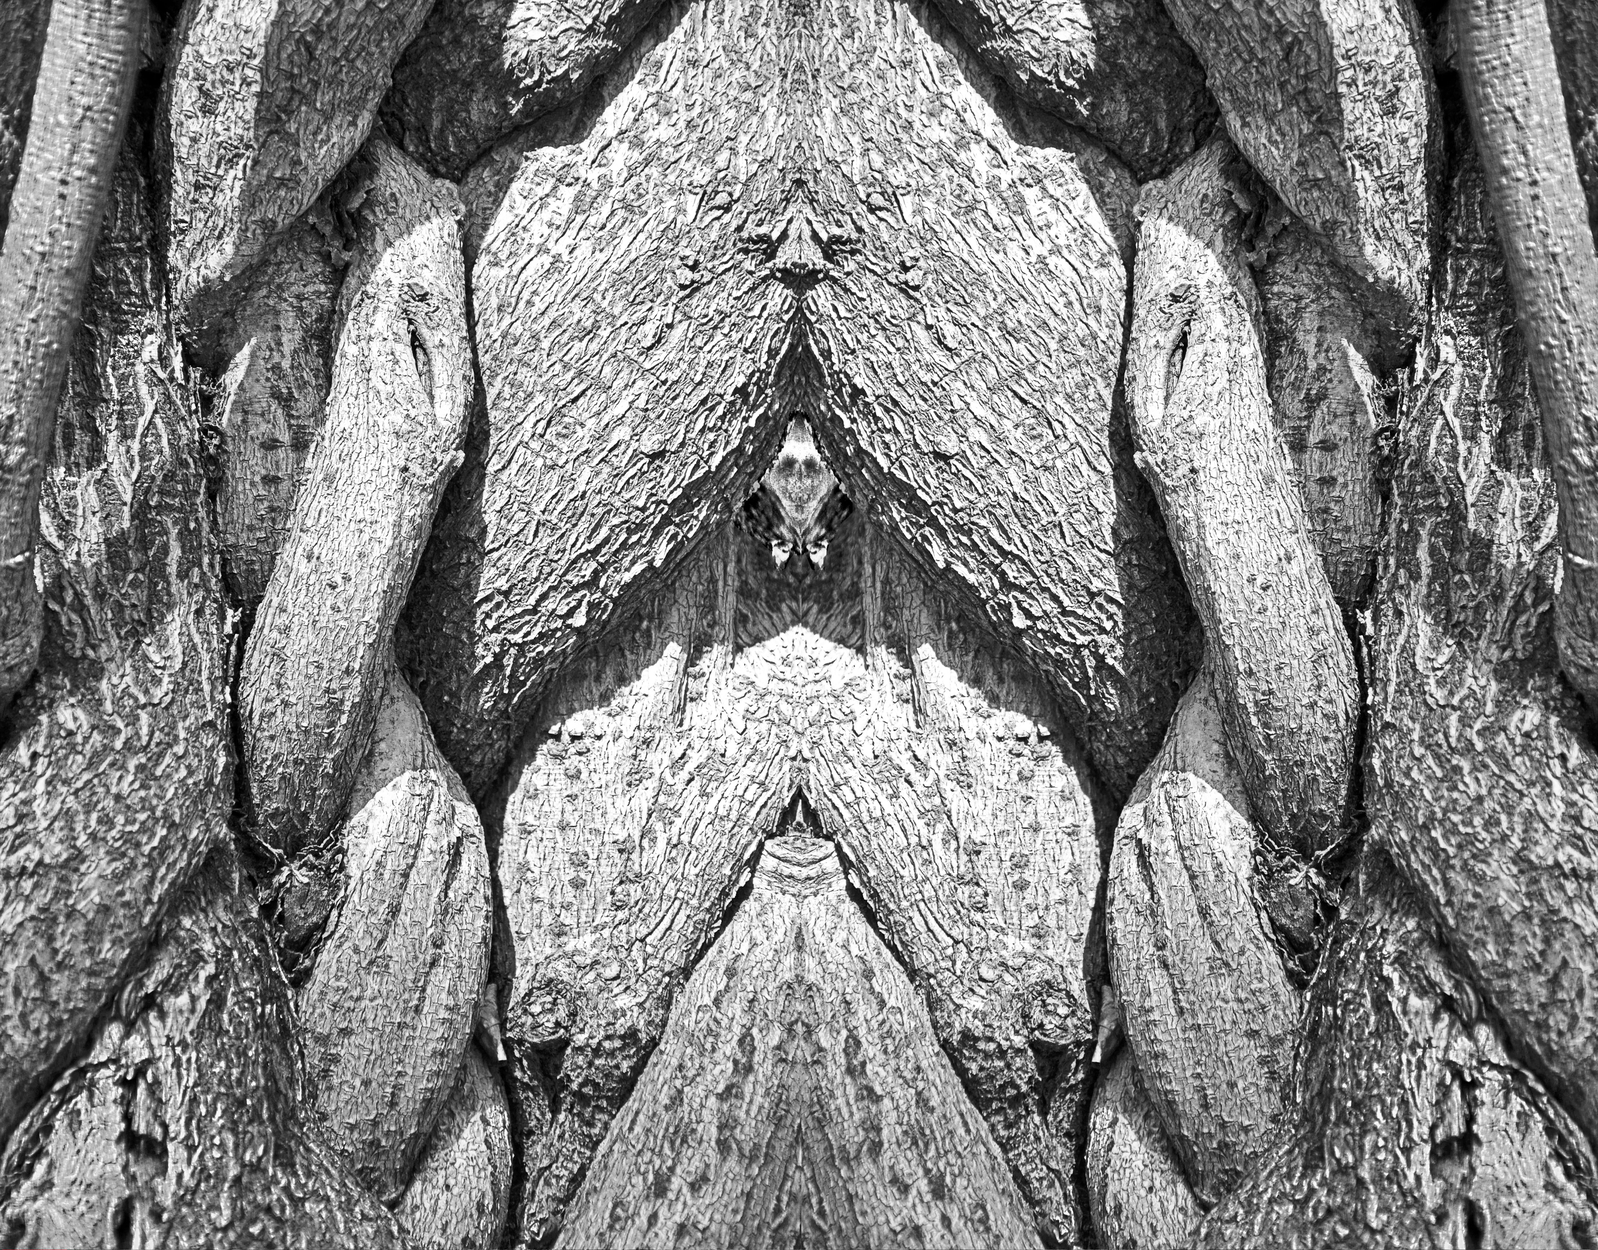 Watcher-Noir Artwork by Leslie Jordan